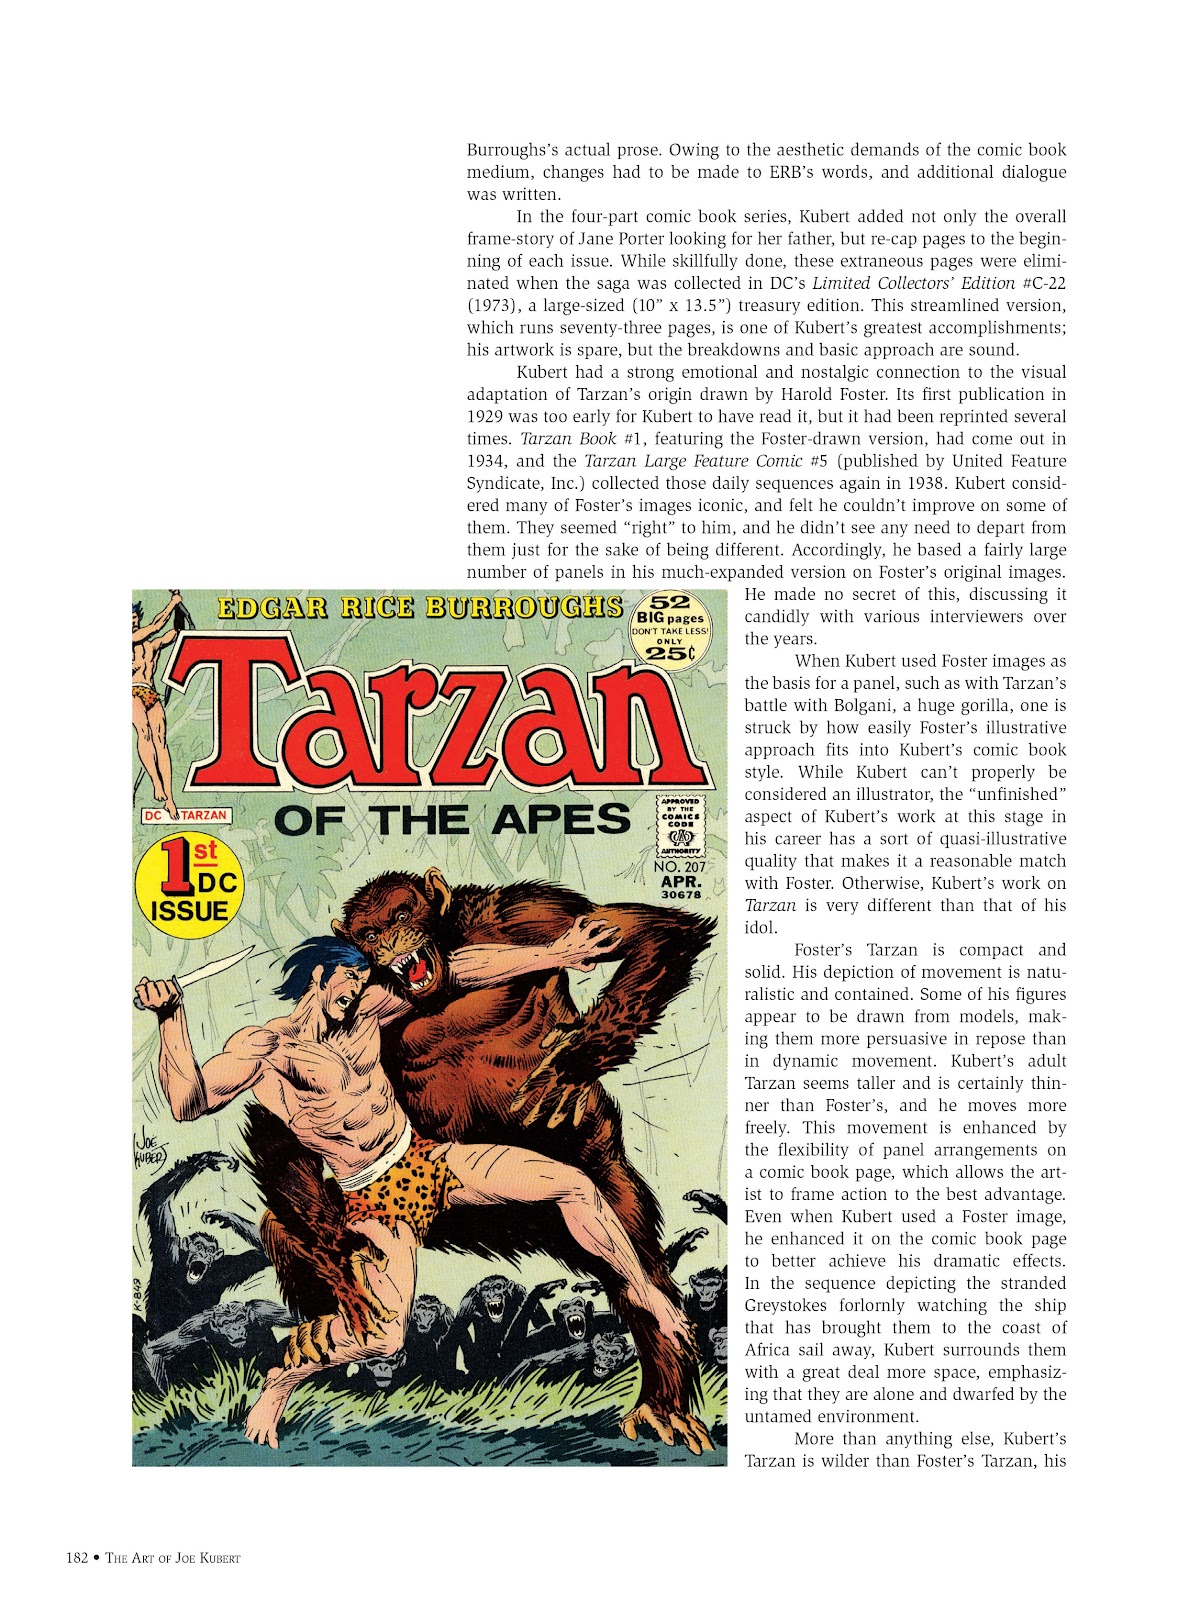 Read online The Art of Joe Kubert comic -  Issue # TPB (Part 2) - 82